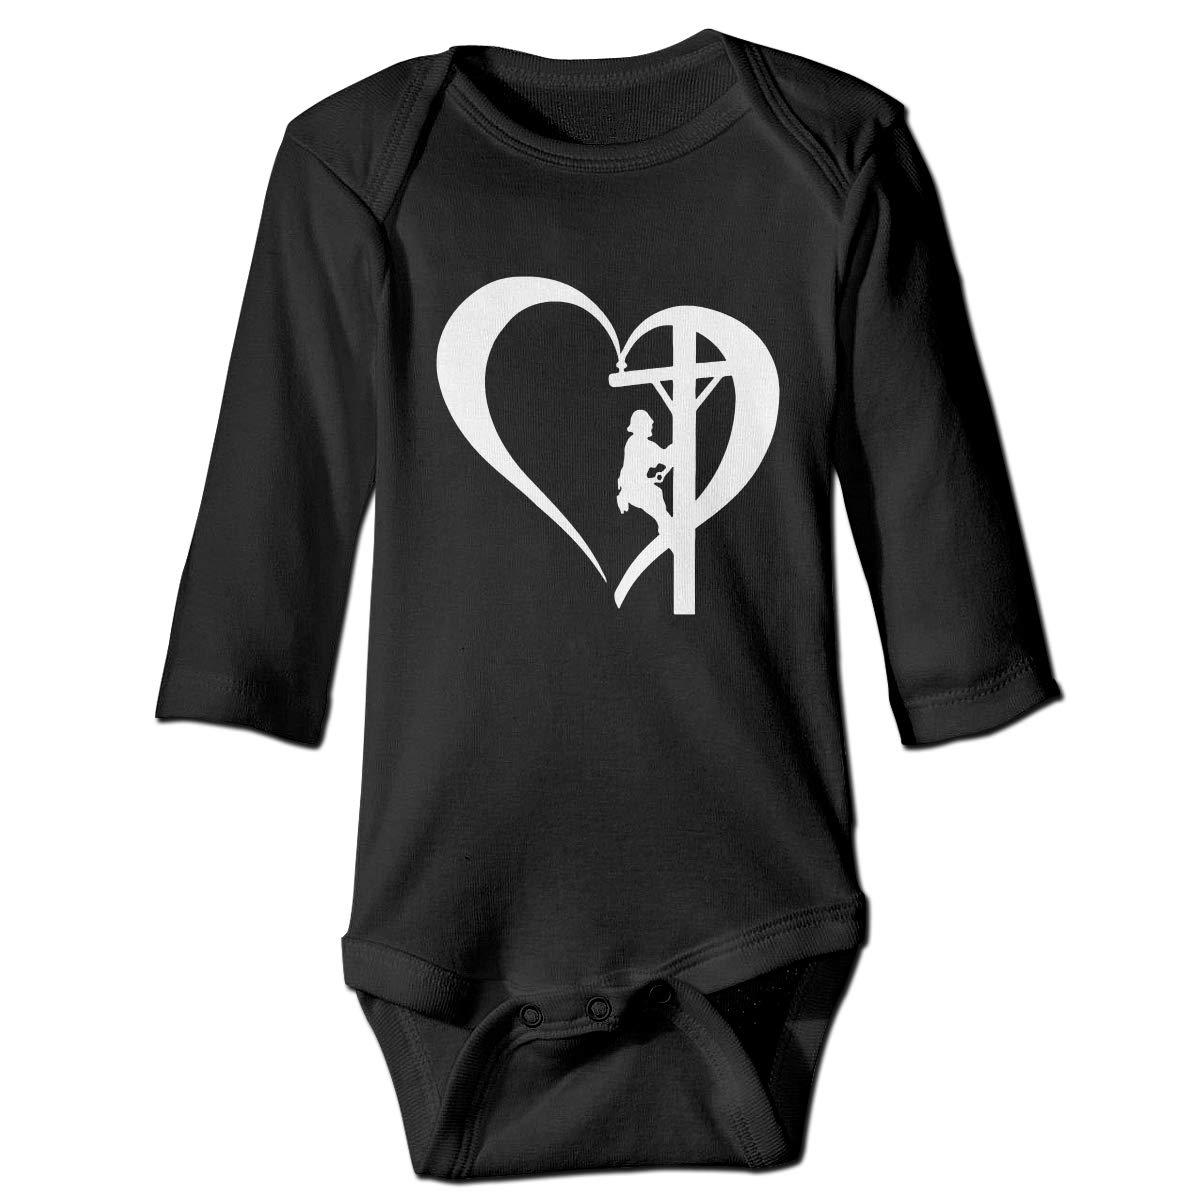 Wangx-4 Infant Toddler Baby I Love My Lineman Long Sleeve Girls Romper 0-24 Months